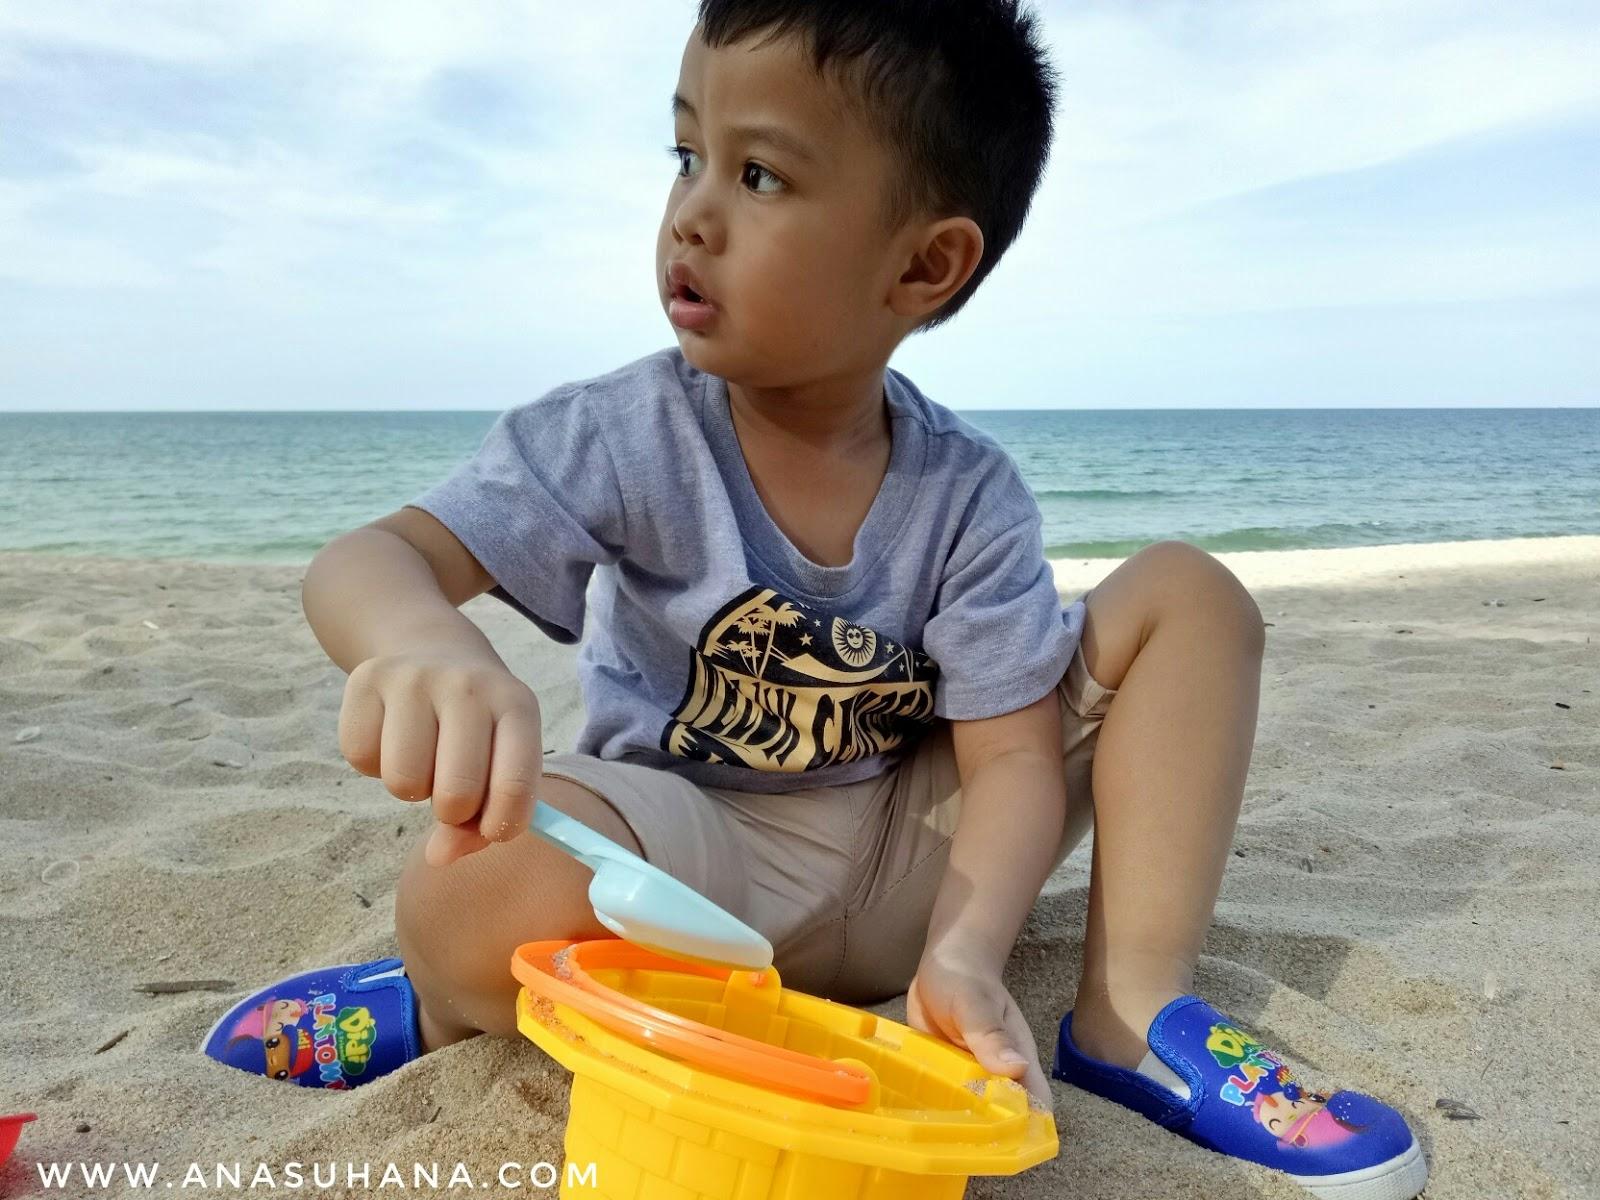 Pantai Batu Buruk, Kuala Terengganu